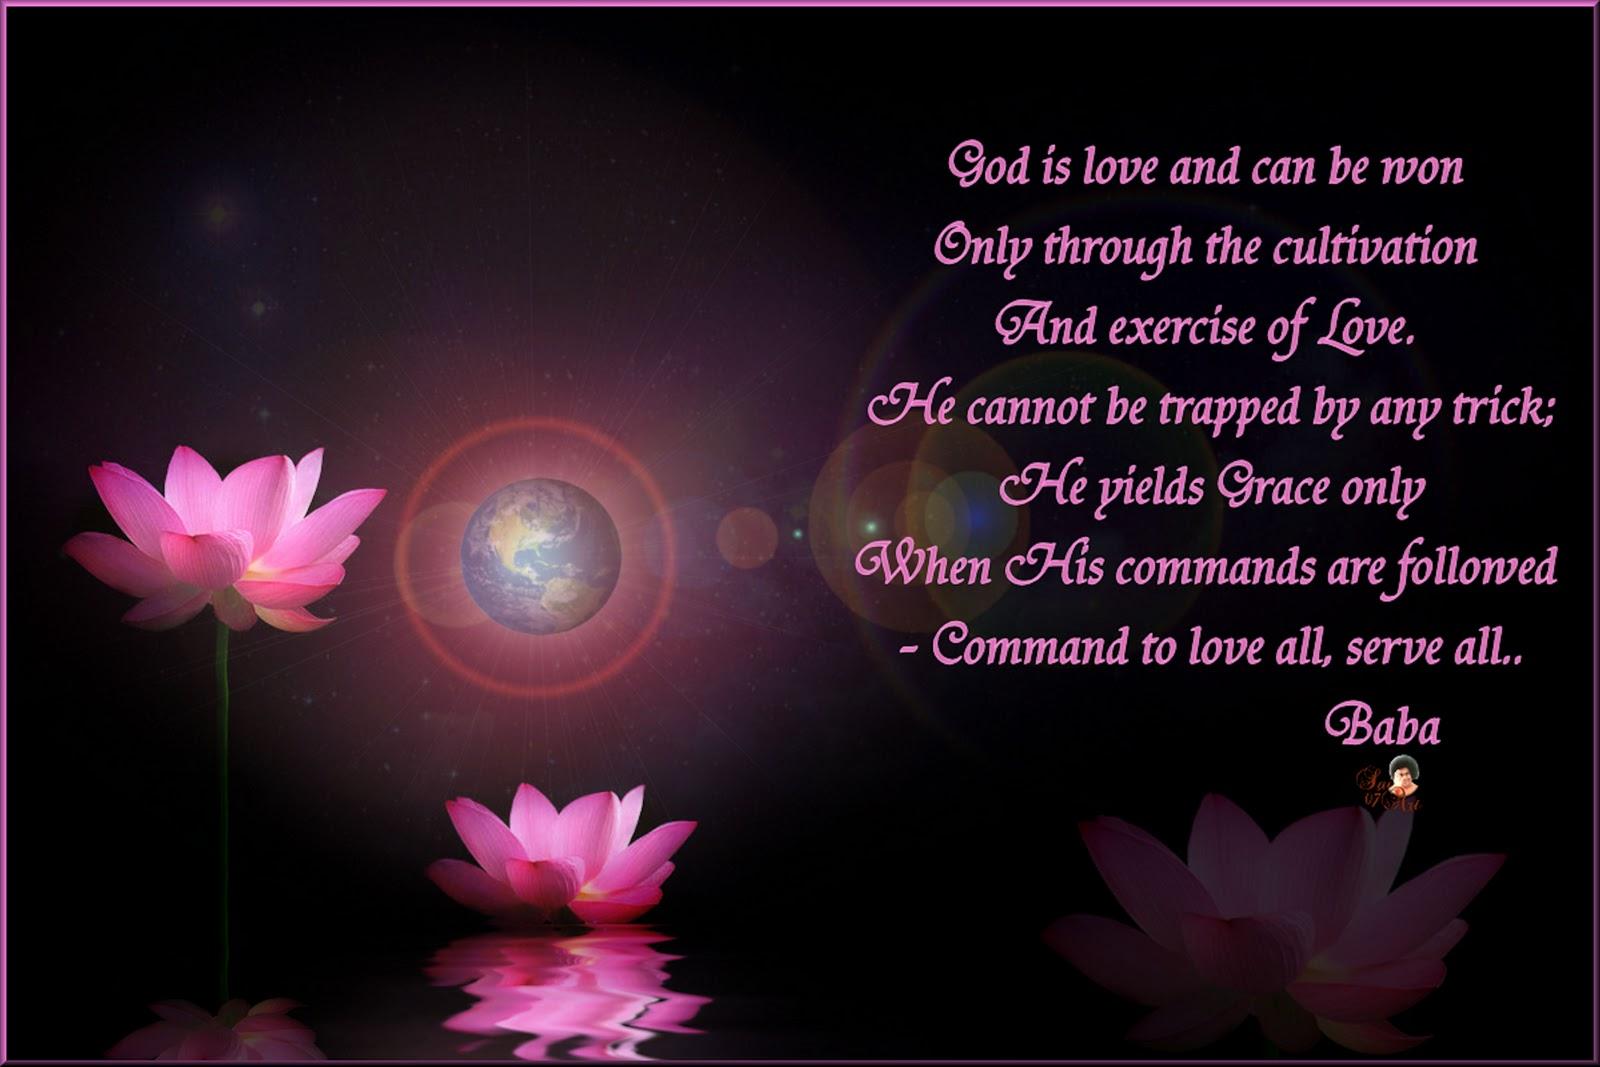 Quotes of bhagavan sri sathya sai baba quote 108 quote 108 izmirmasajfo